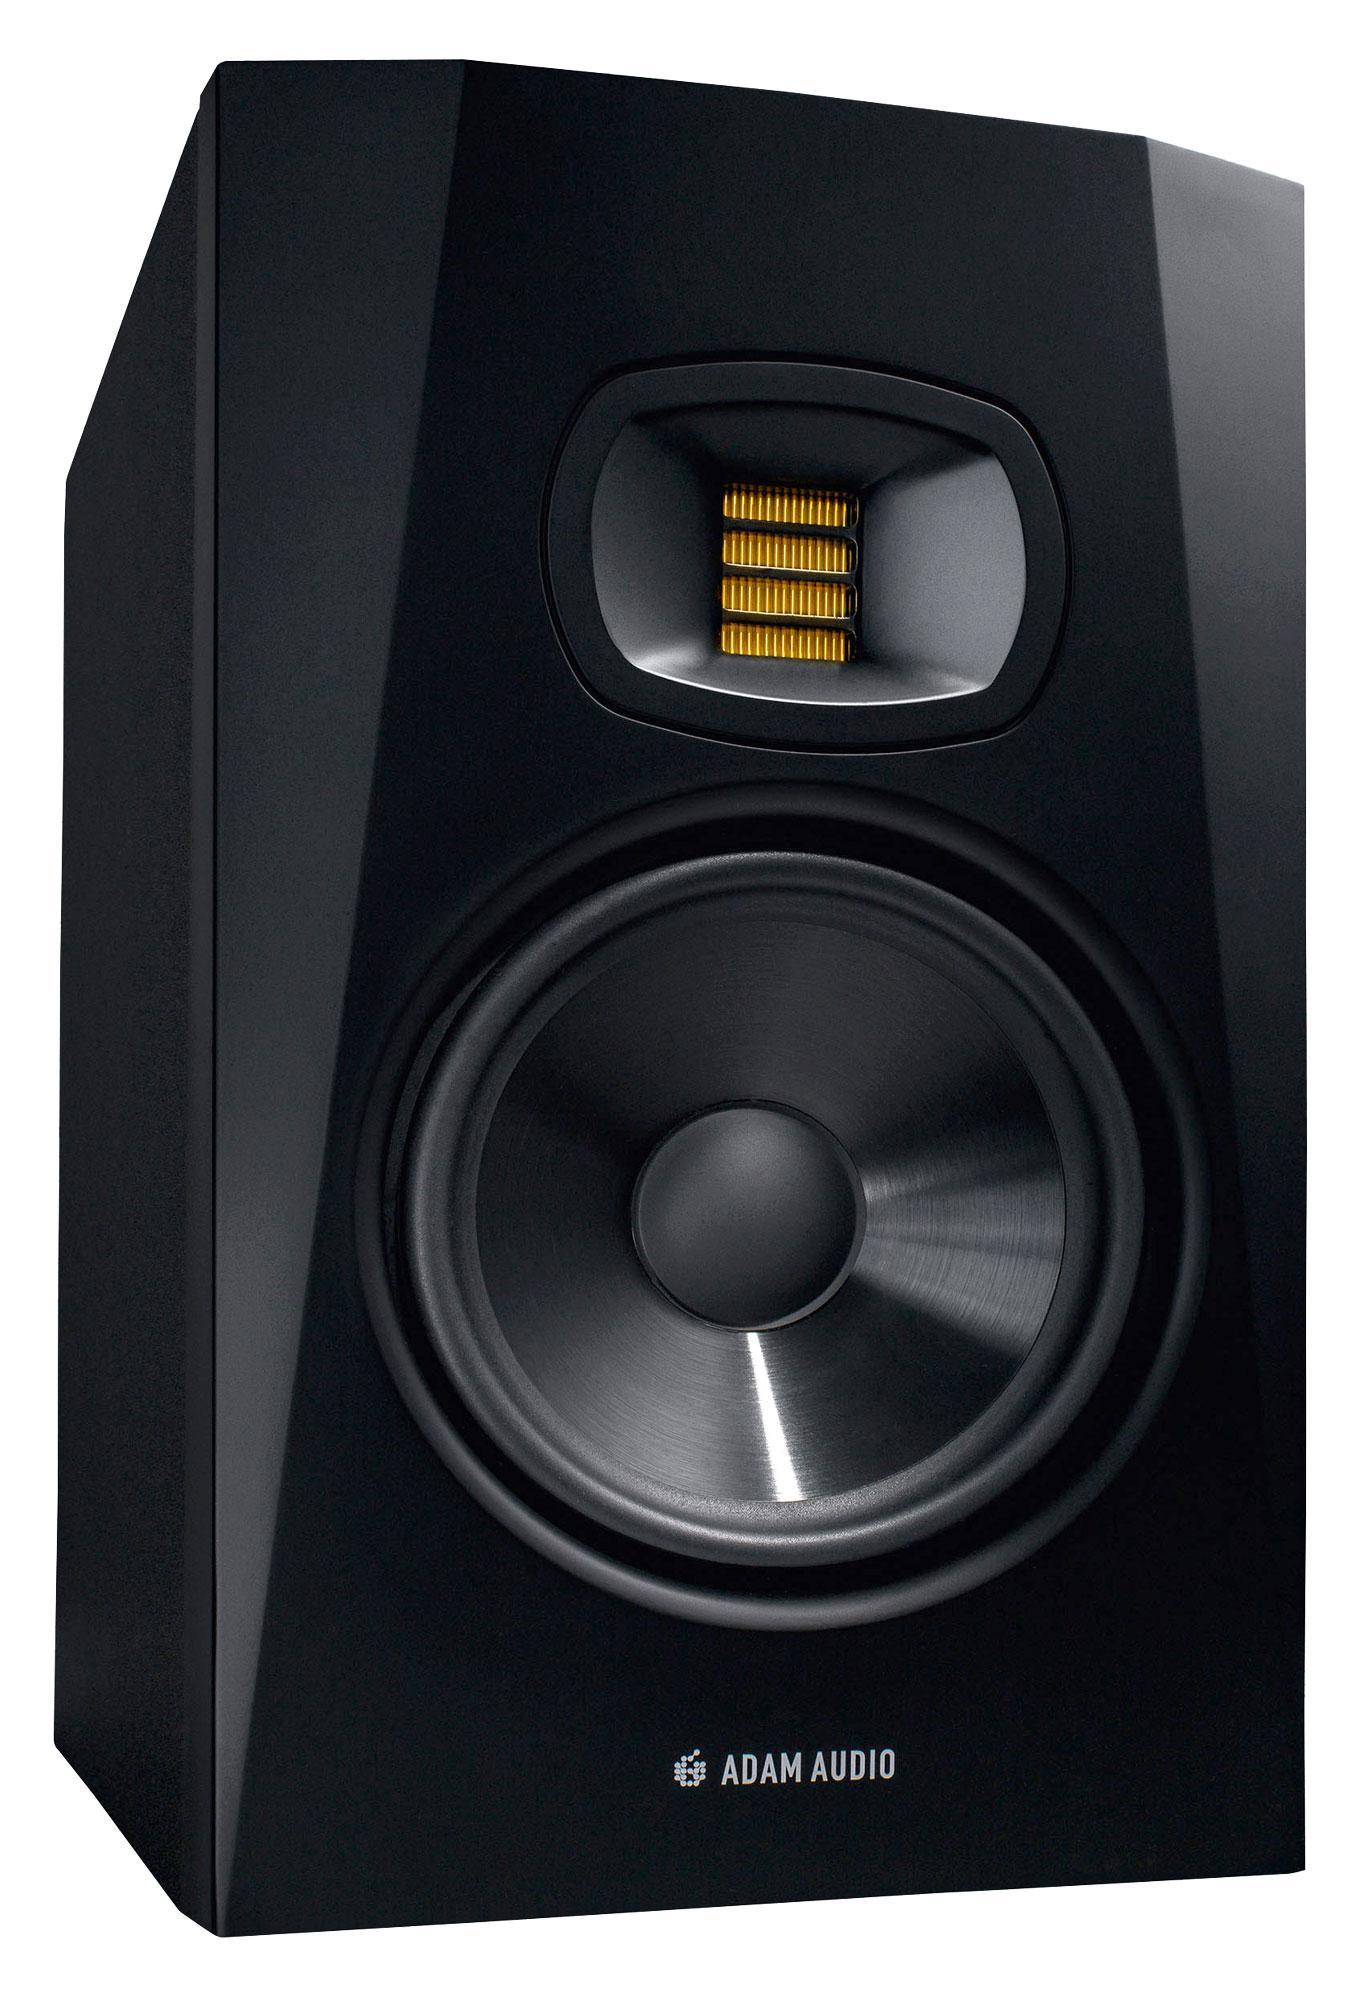 Studiomonitore - Adam Audio T7V - Onlineshop Musikhaus Kirstein